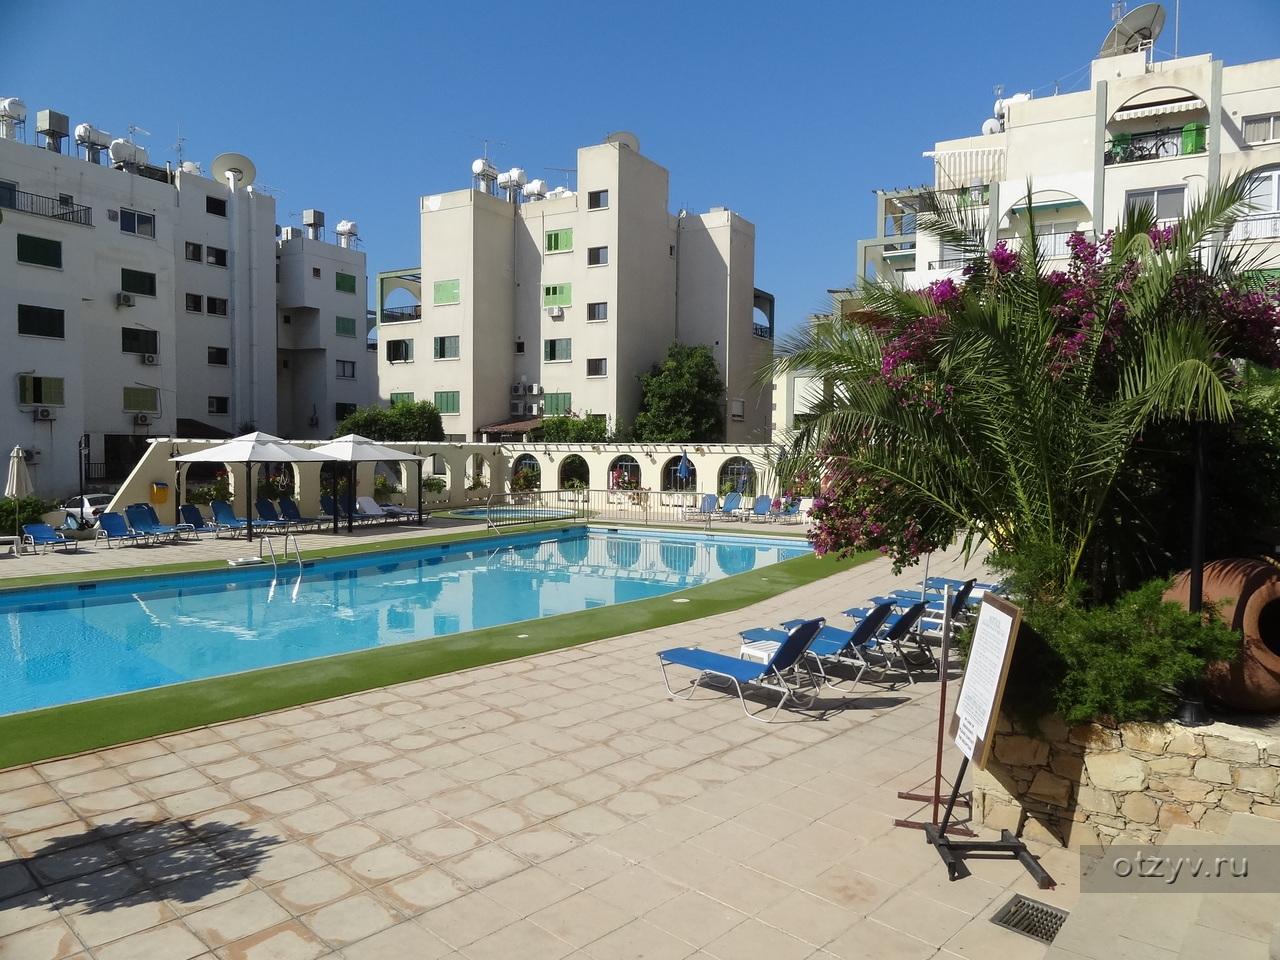 Navarria hotel 3 лимассол отзывы